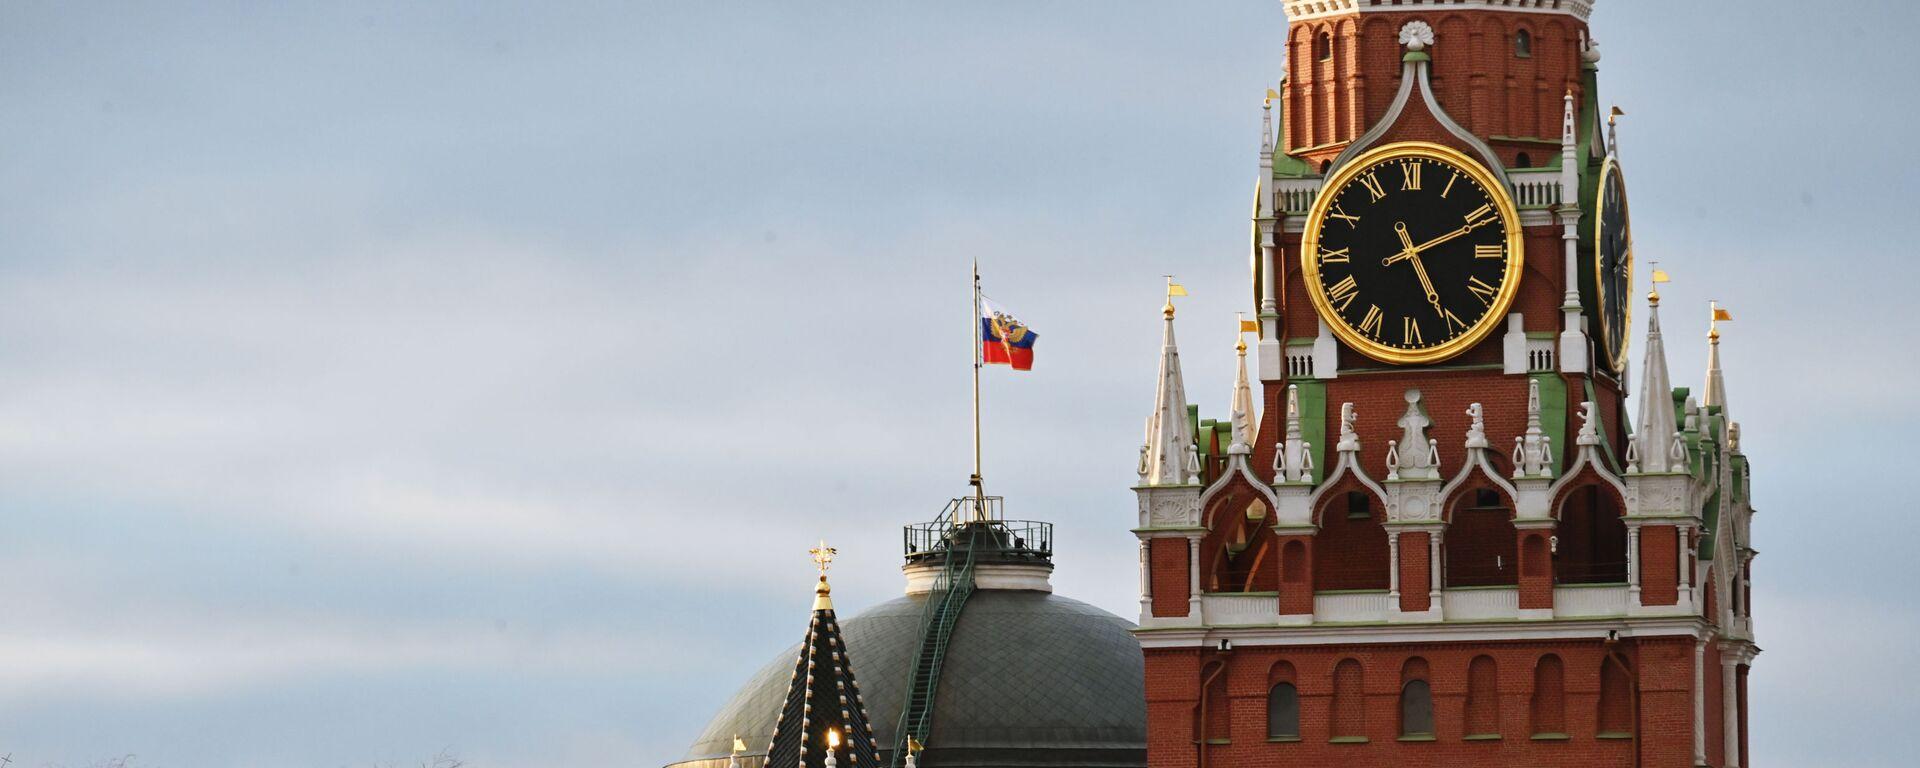 Kreml moskiewski - Sputnik Polska, 1920, 25.03.2021